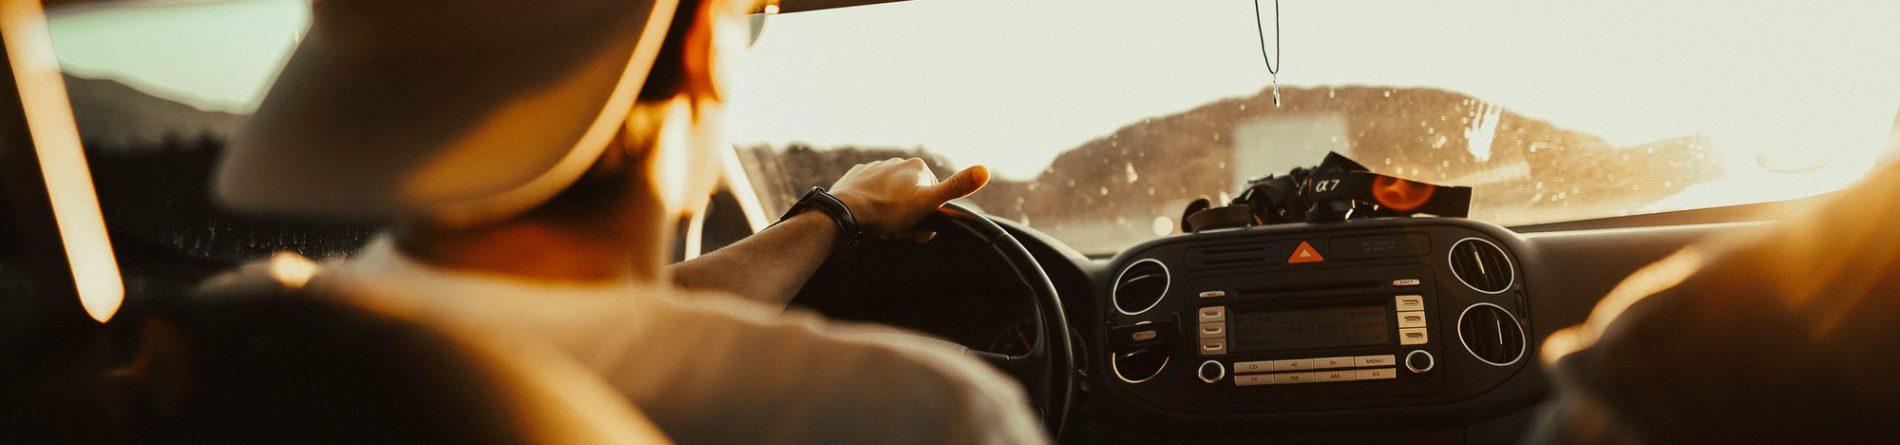 bilsyn randers haraldsvej